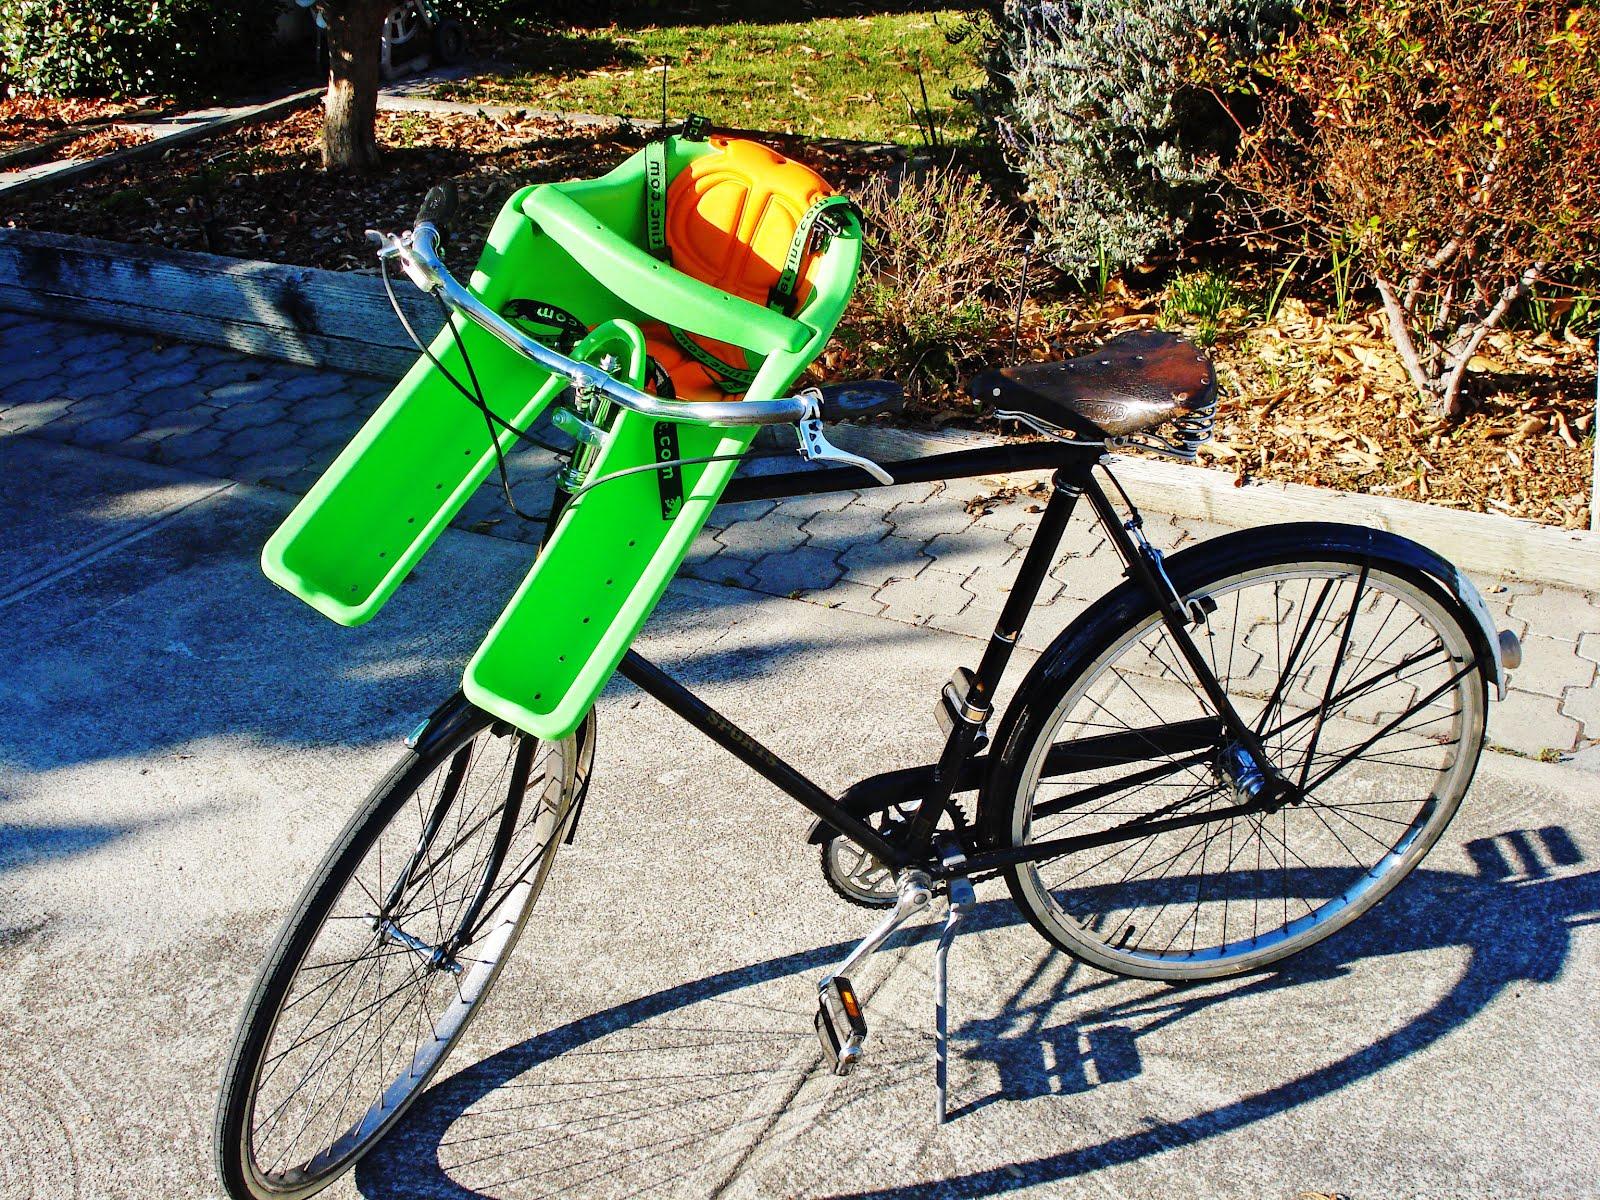 Ibert baby bike seat self wrapping braided sleeving